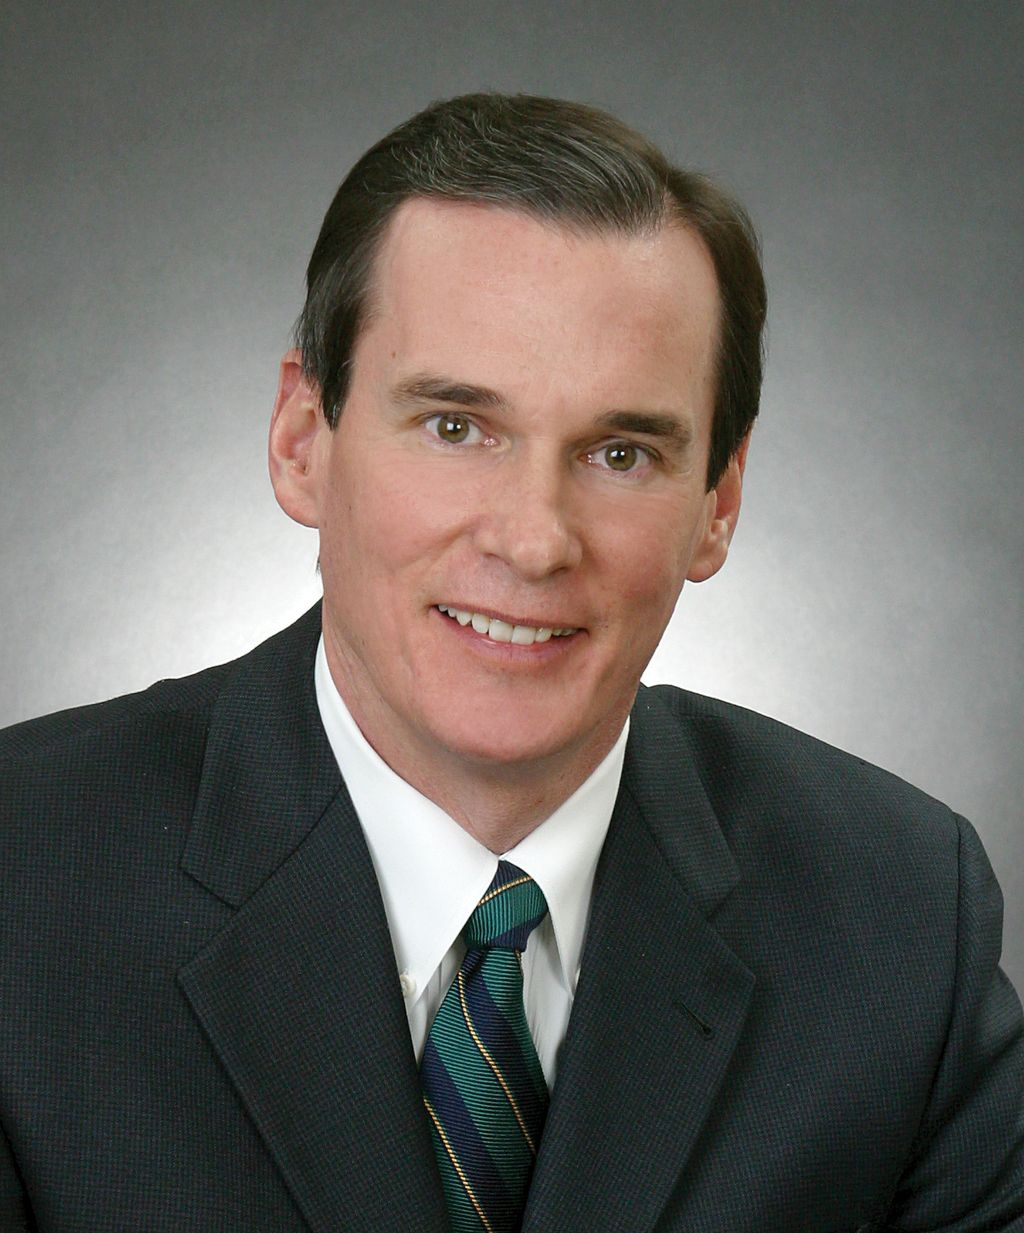 Jerry Rotunno